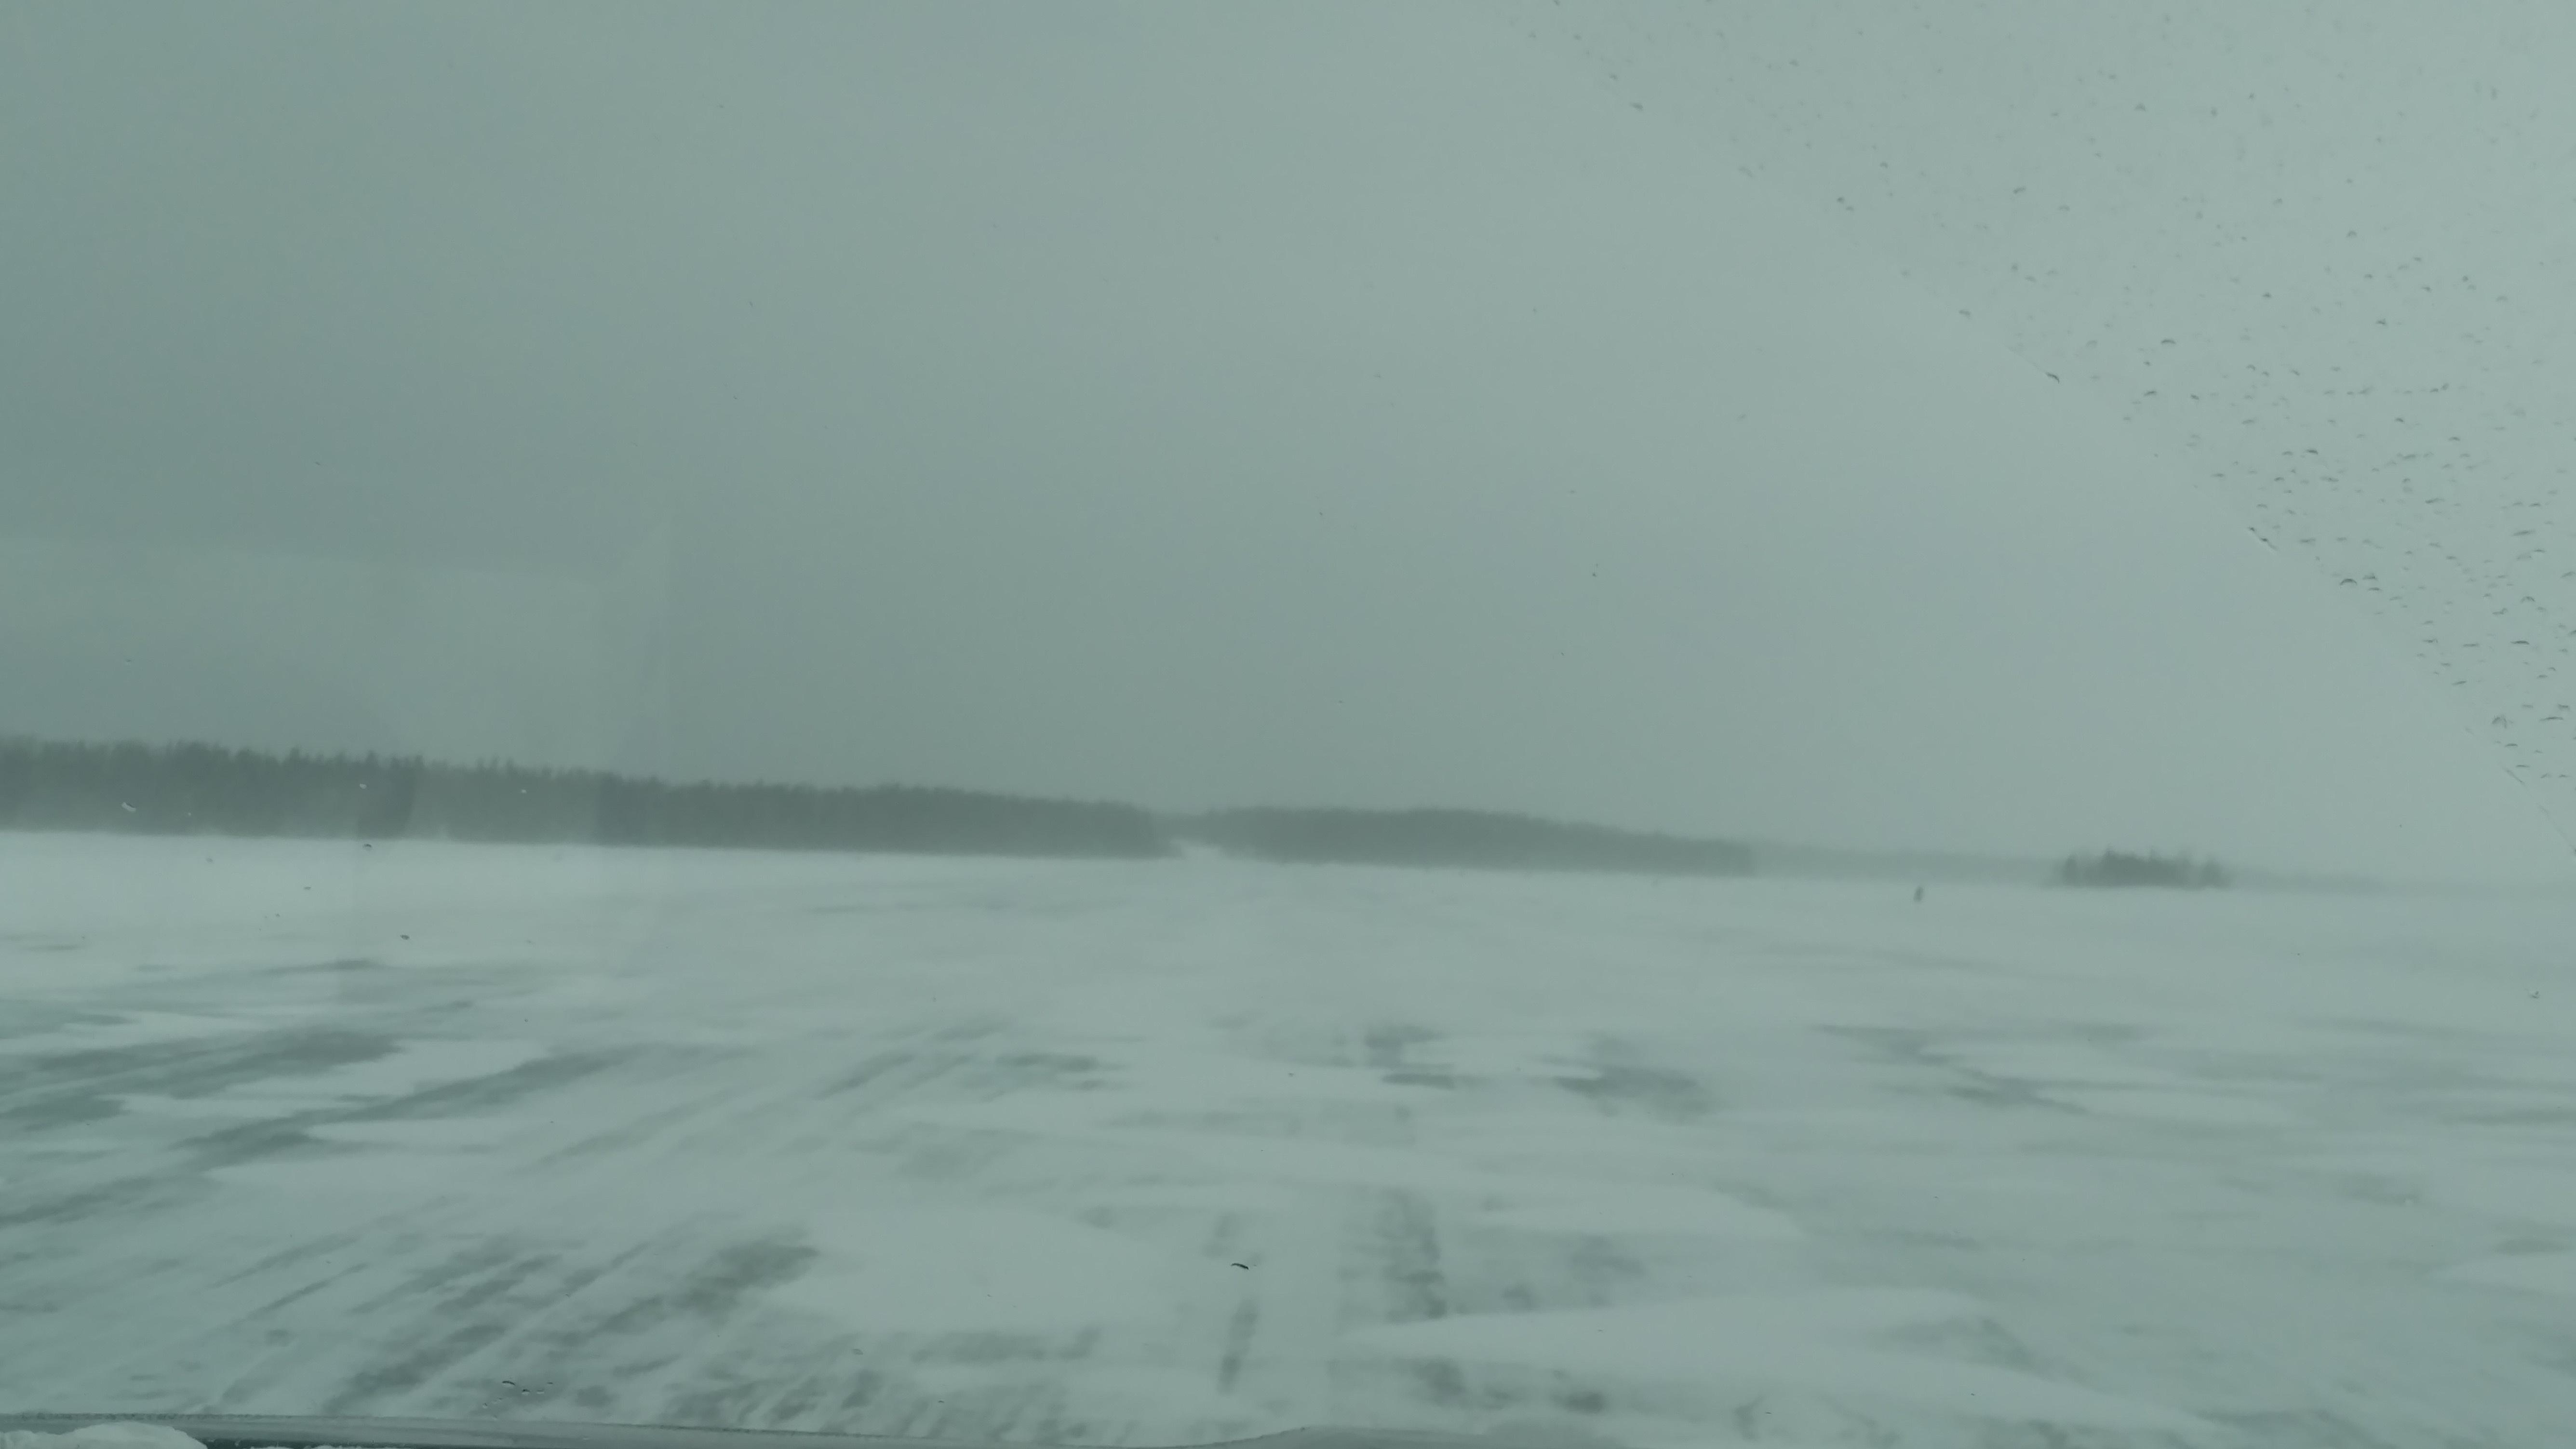 1-ice road round lake 3-16